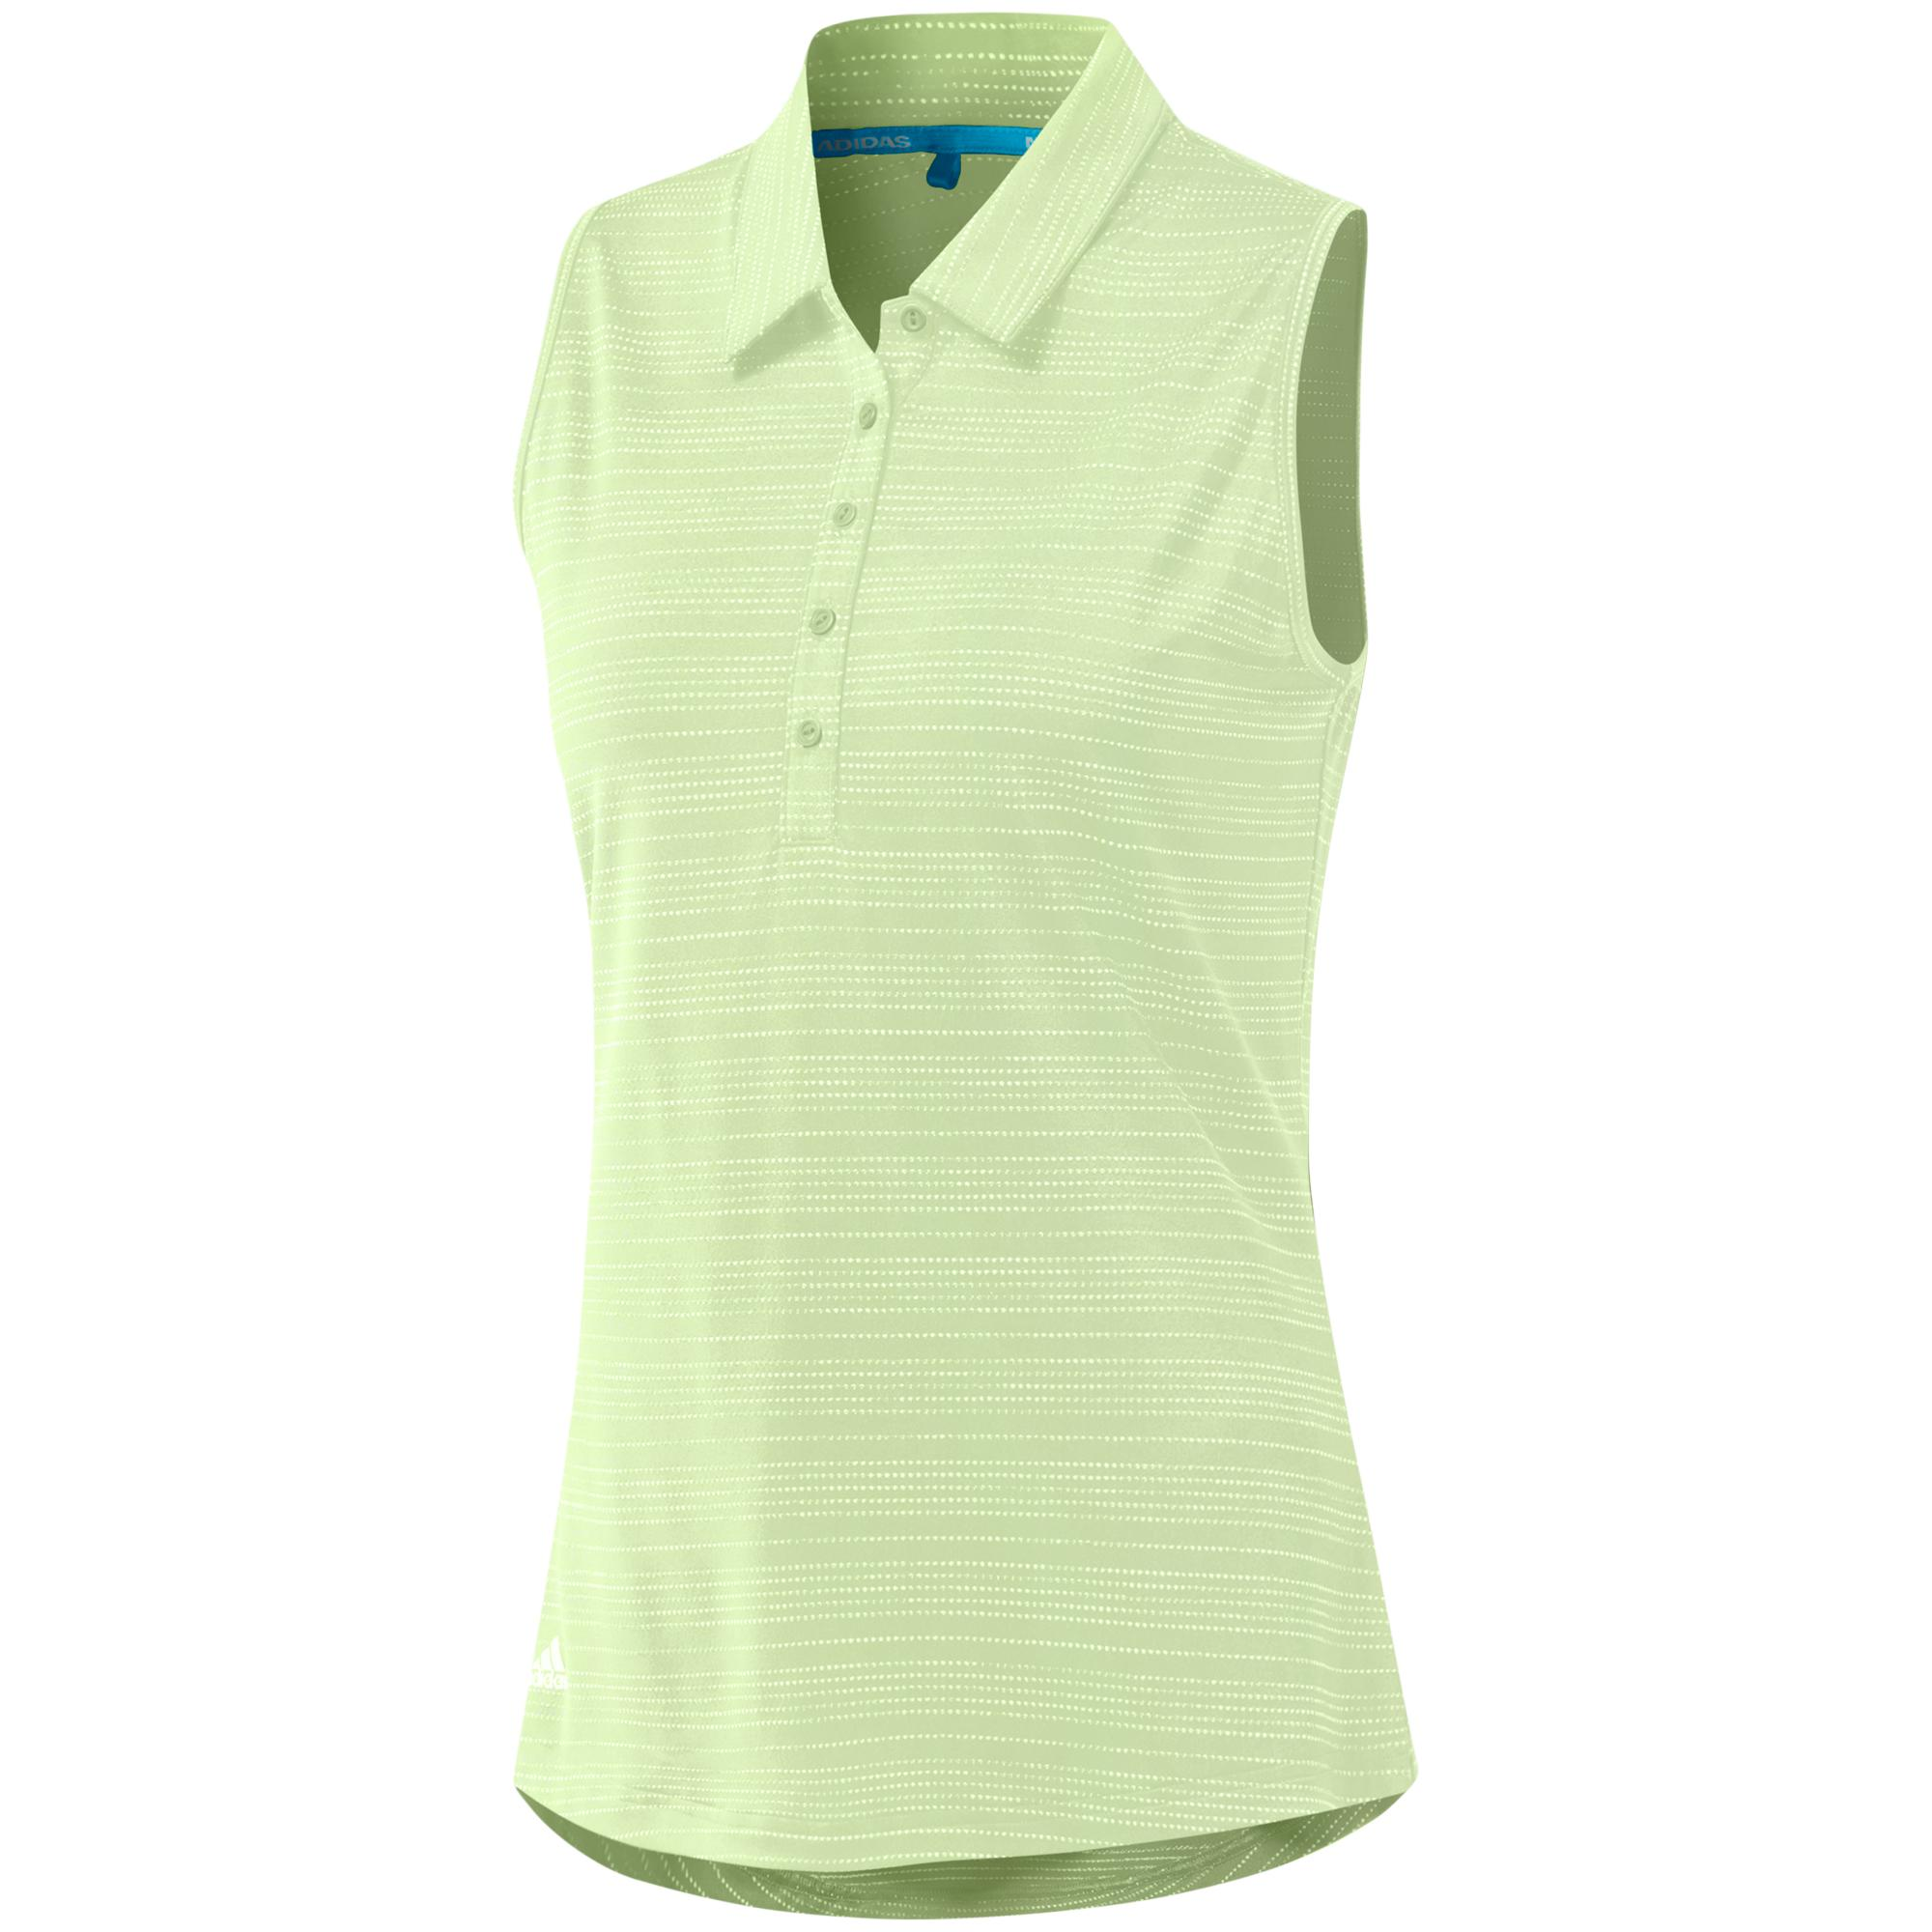 5f7a242f92fda Women's Sport Performance Novelty Sleeveless Polo   ADIDAS   Golf Town  Limited